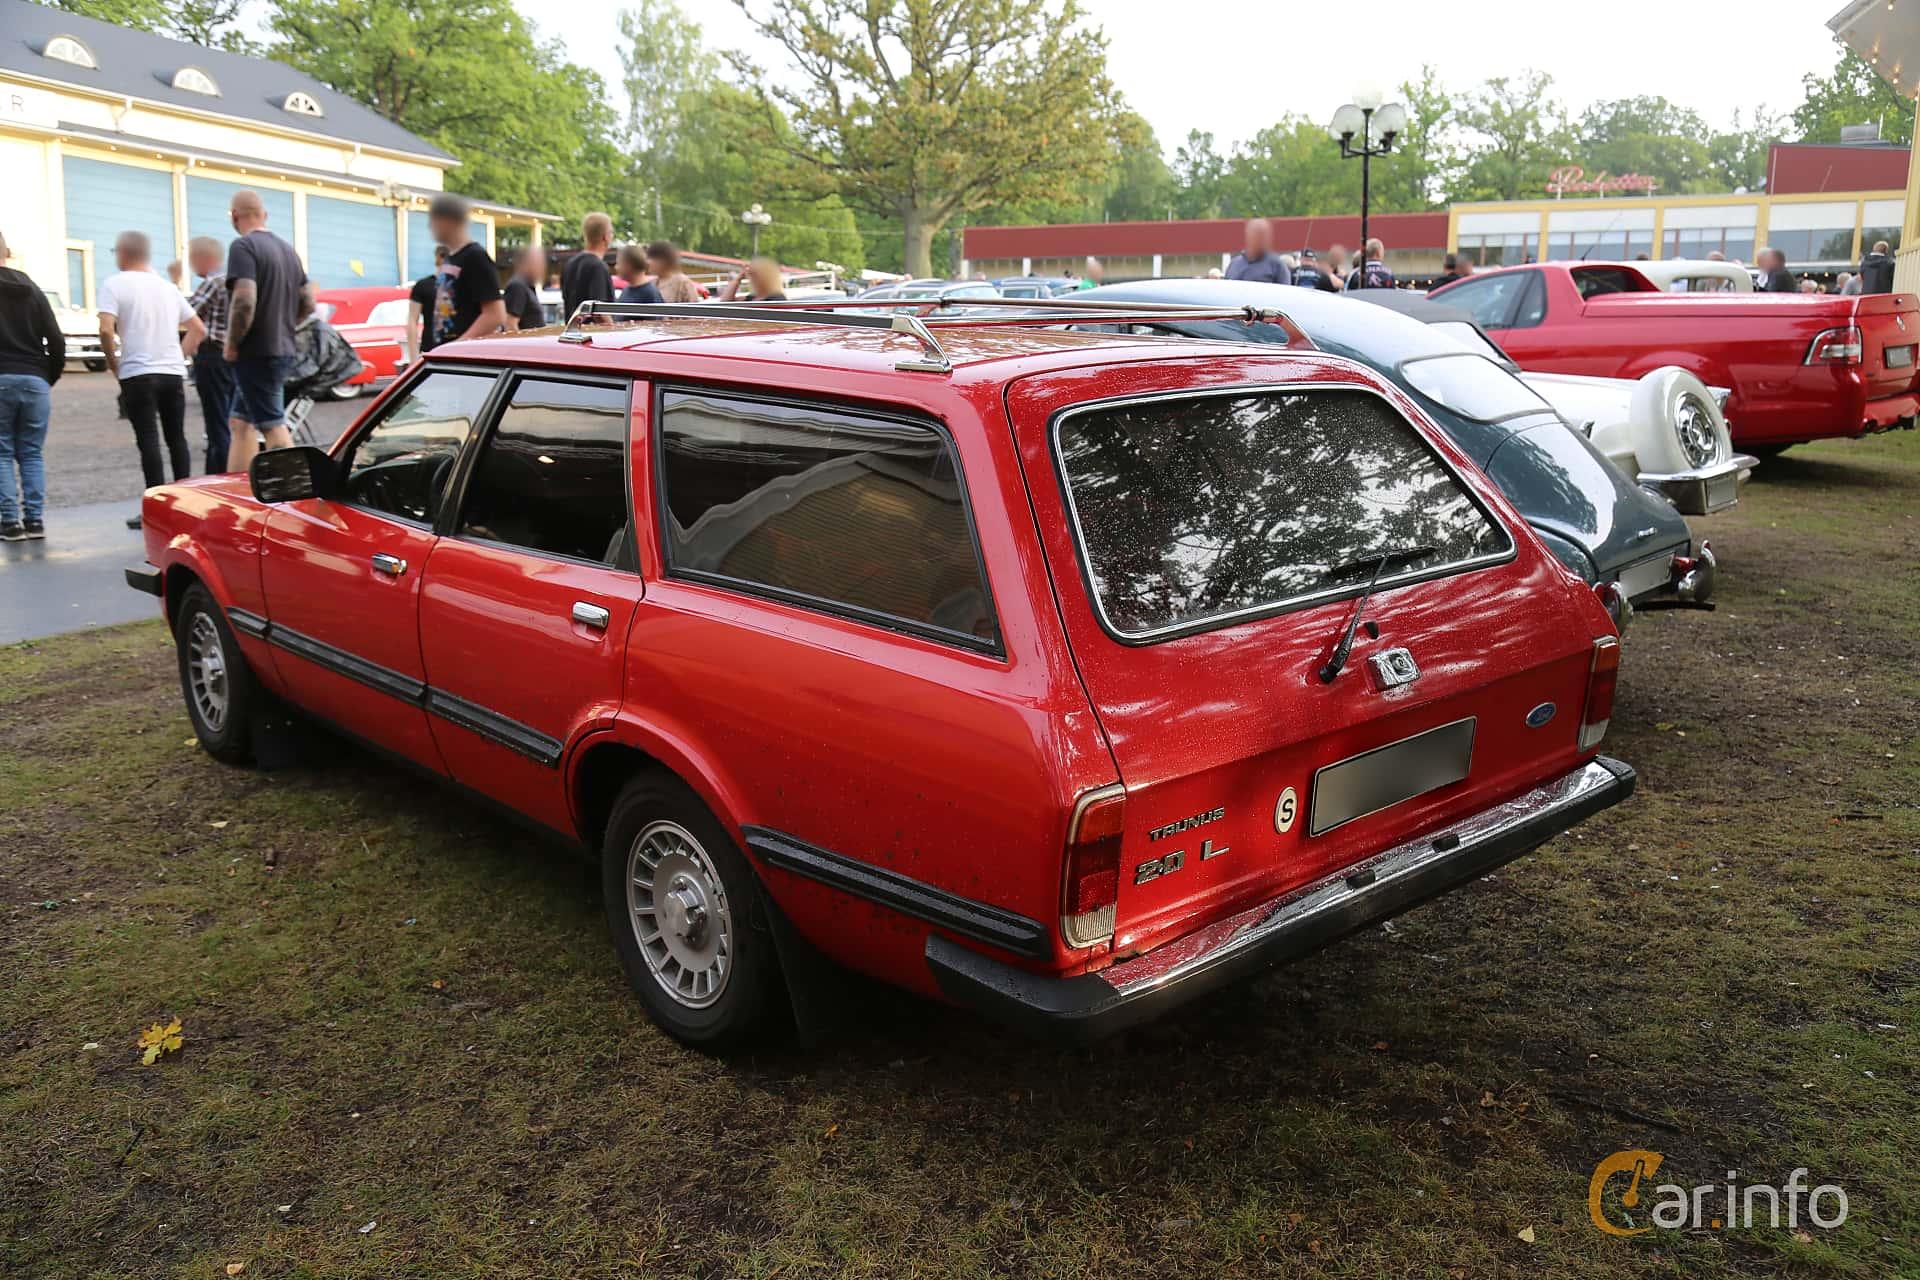 Ford Taunus Kombi 2.0 Manual, 98hp, 1981 at Bil & MC-träffar i Huskvarna Folkets Park 2019 Amerikanska fordon